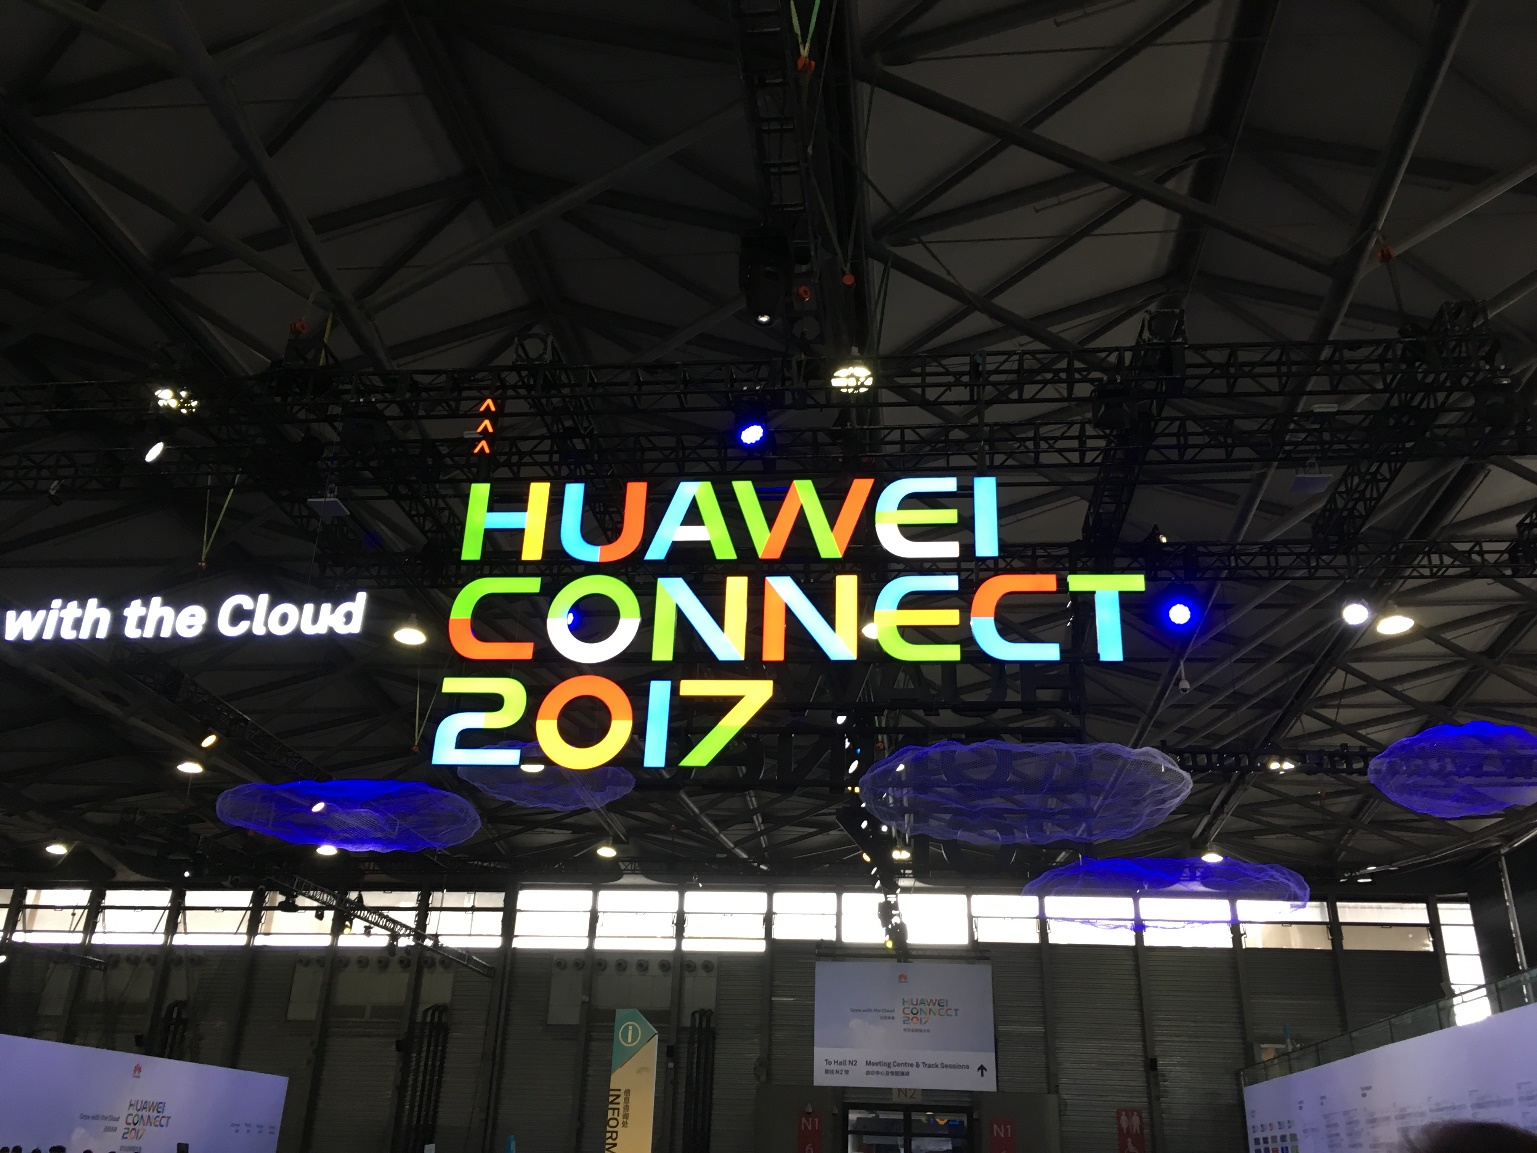 Китай — цифровая держава. Впечатления от Huawei Connect 2017 - 1